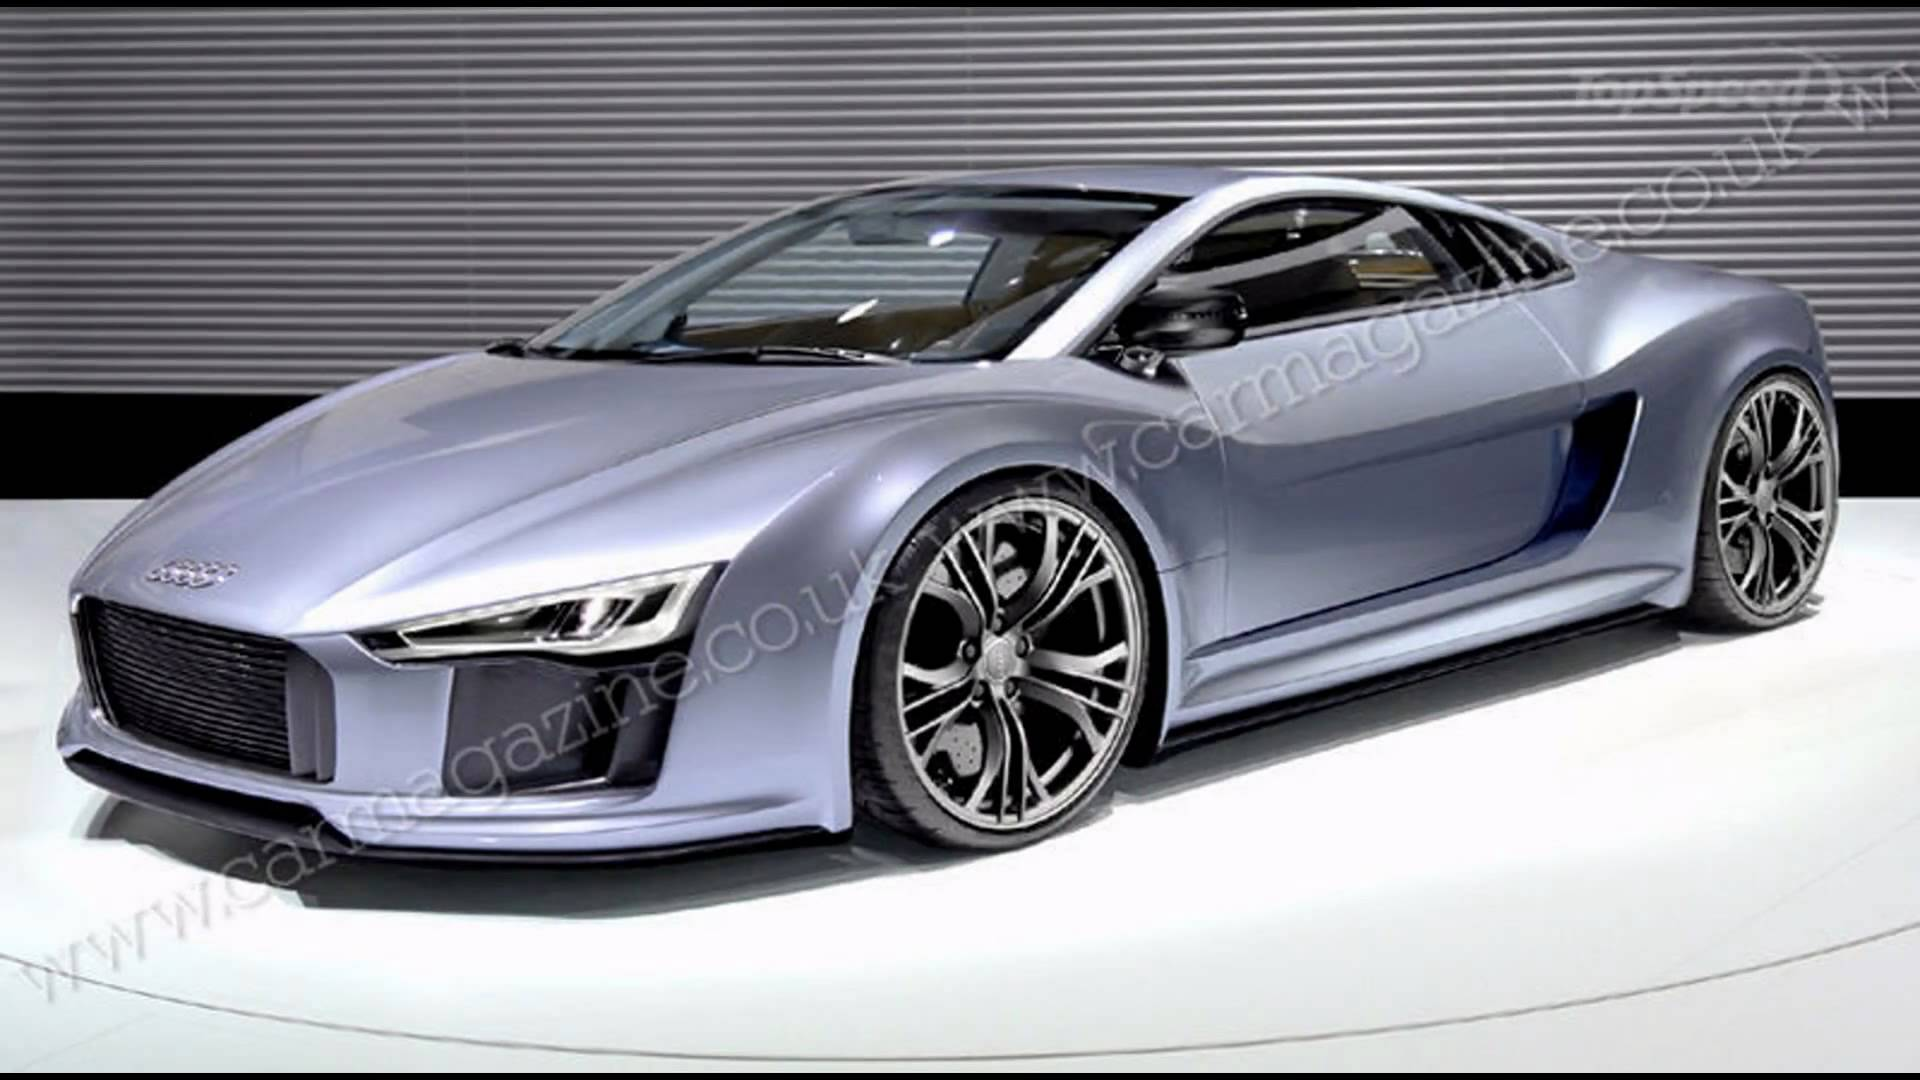 New Audi R8 2013